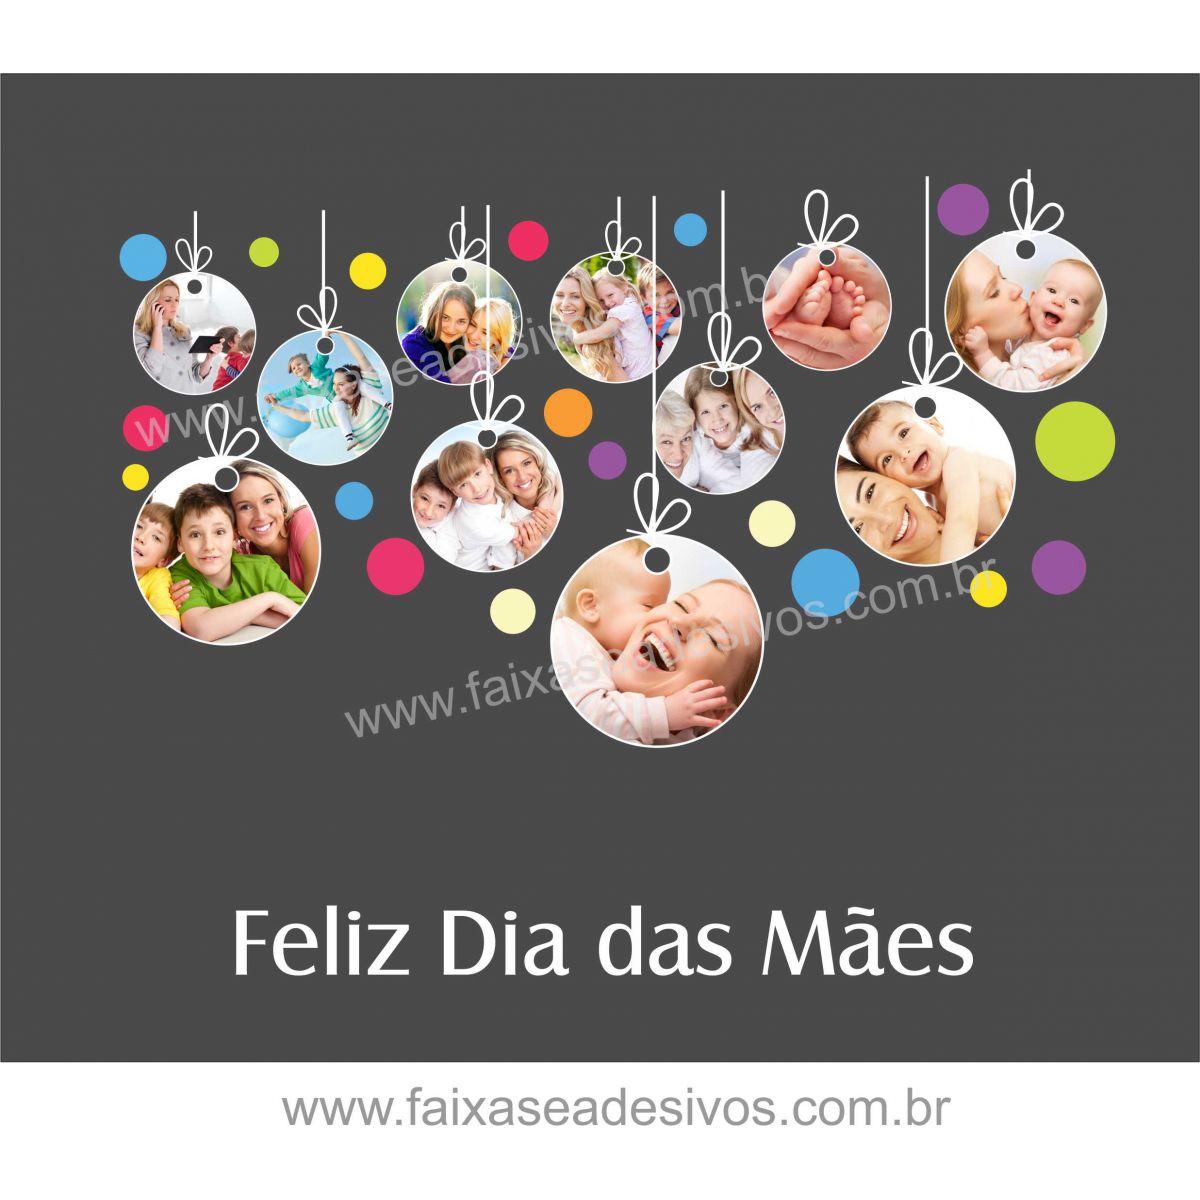 A525M - Adesivo Dia das Mães - Tags de fotos  - Fac Signs